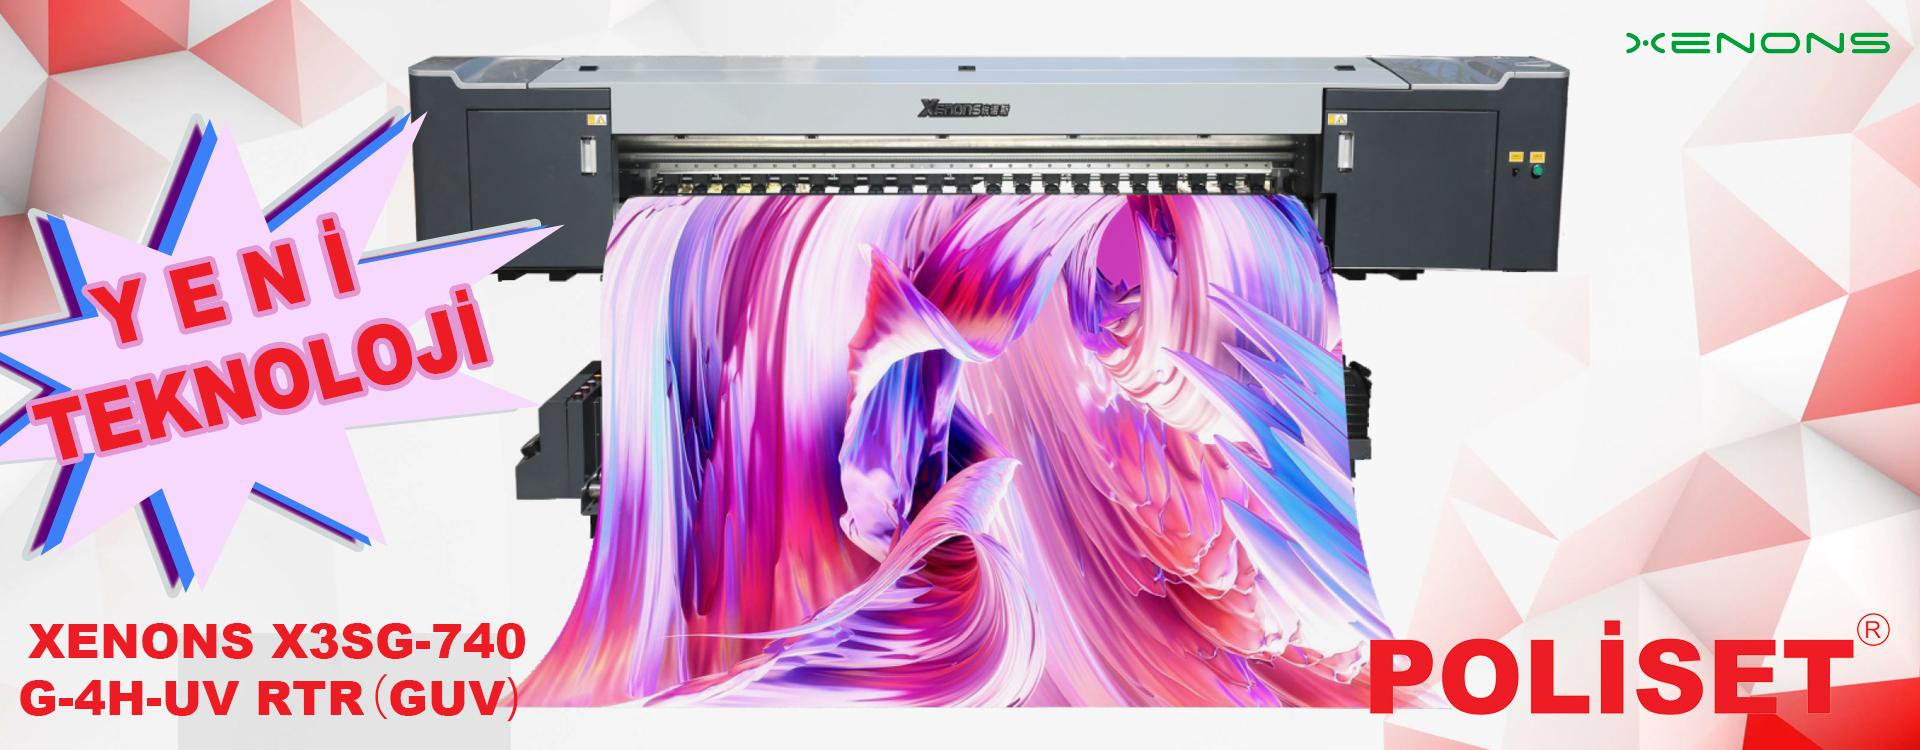 XENONS_X3SG_740G_4H_UV_RTR_guv_uv_printer_son_teknoloji_satis_istanbul_bayi